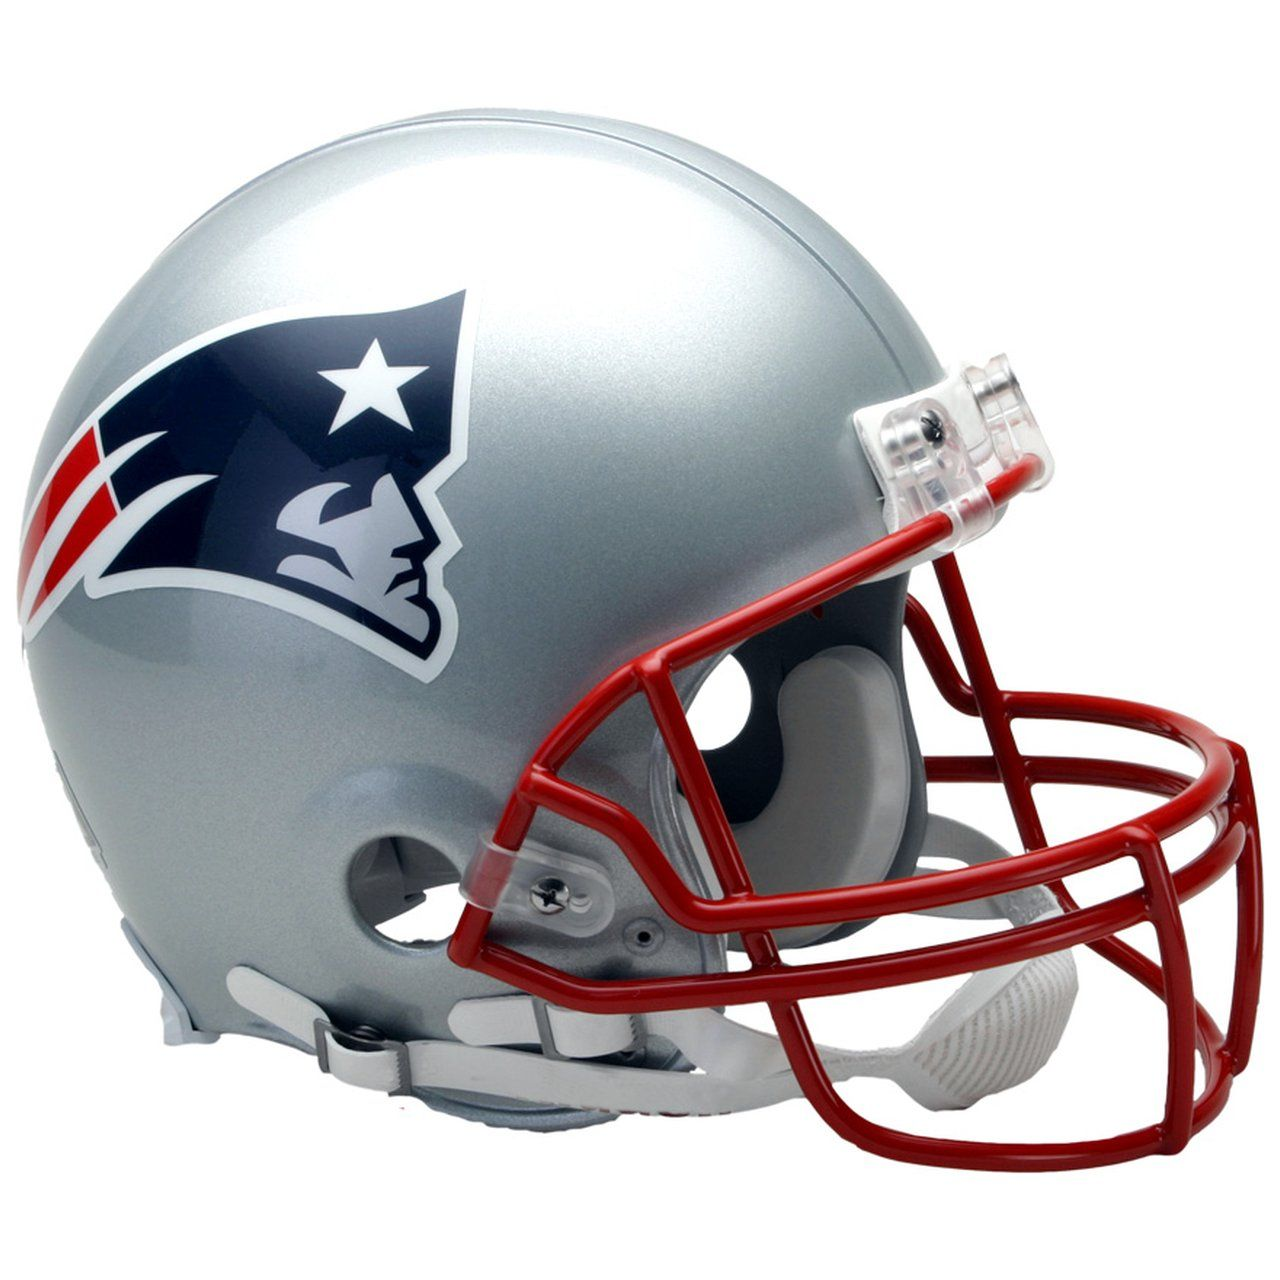 amfoo - Riddell VSR4 Authentic Football Helm - New England Patriots